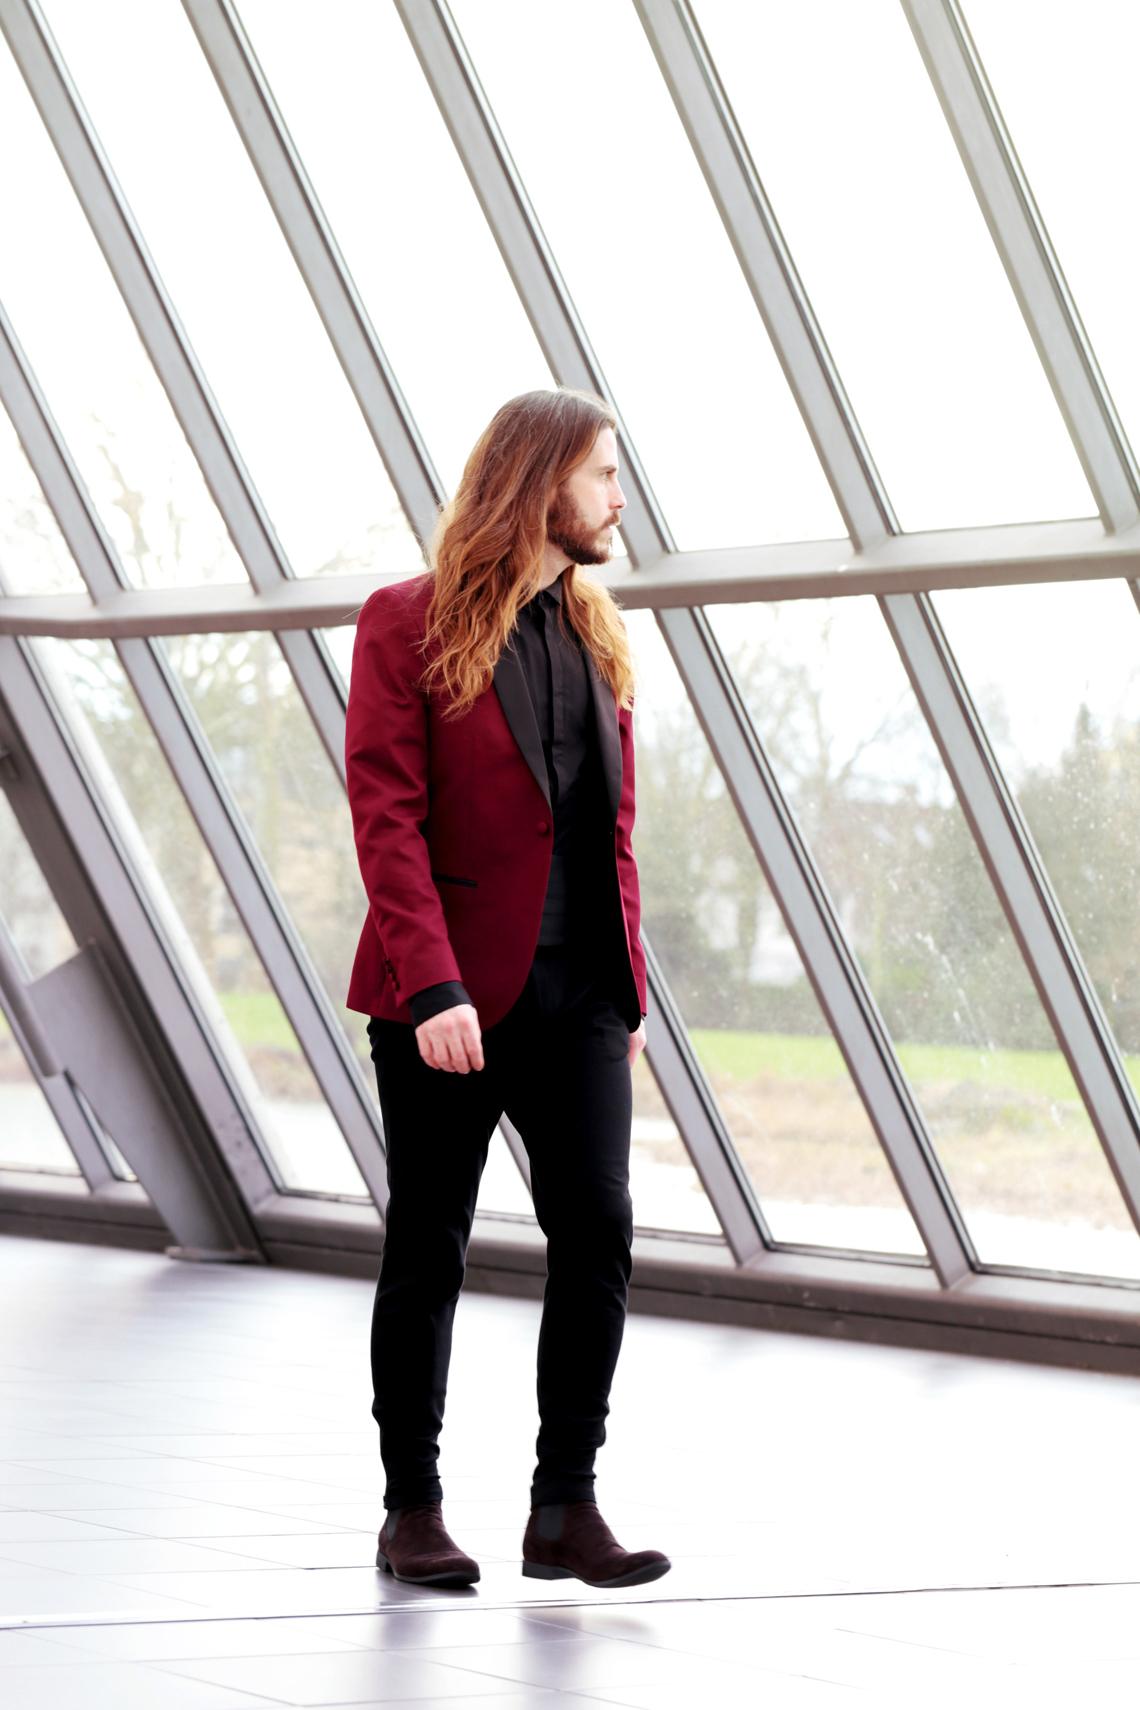 Kaisers-neue-Kleider-Männerblog-Mode-Fashionblog-Smokingjacke-Stoffhose-Kombination-Desert-Boots